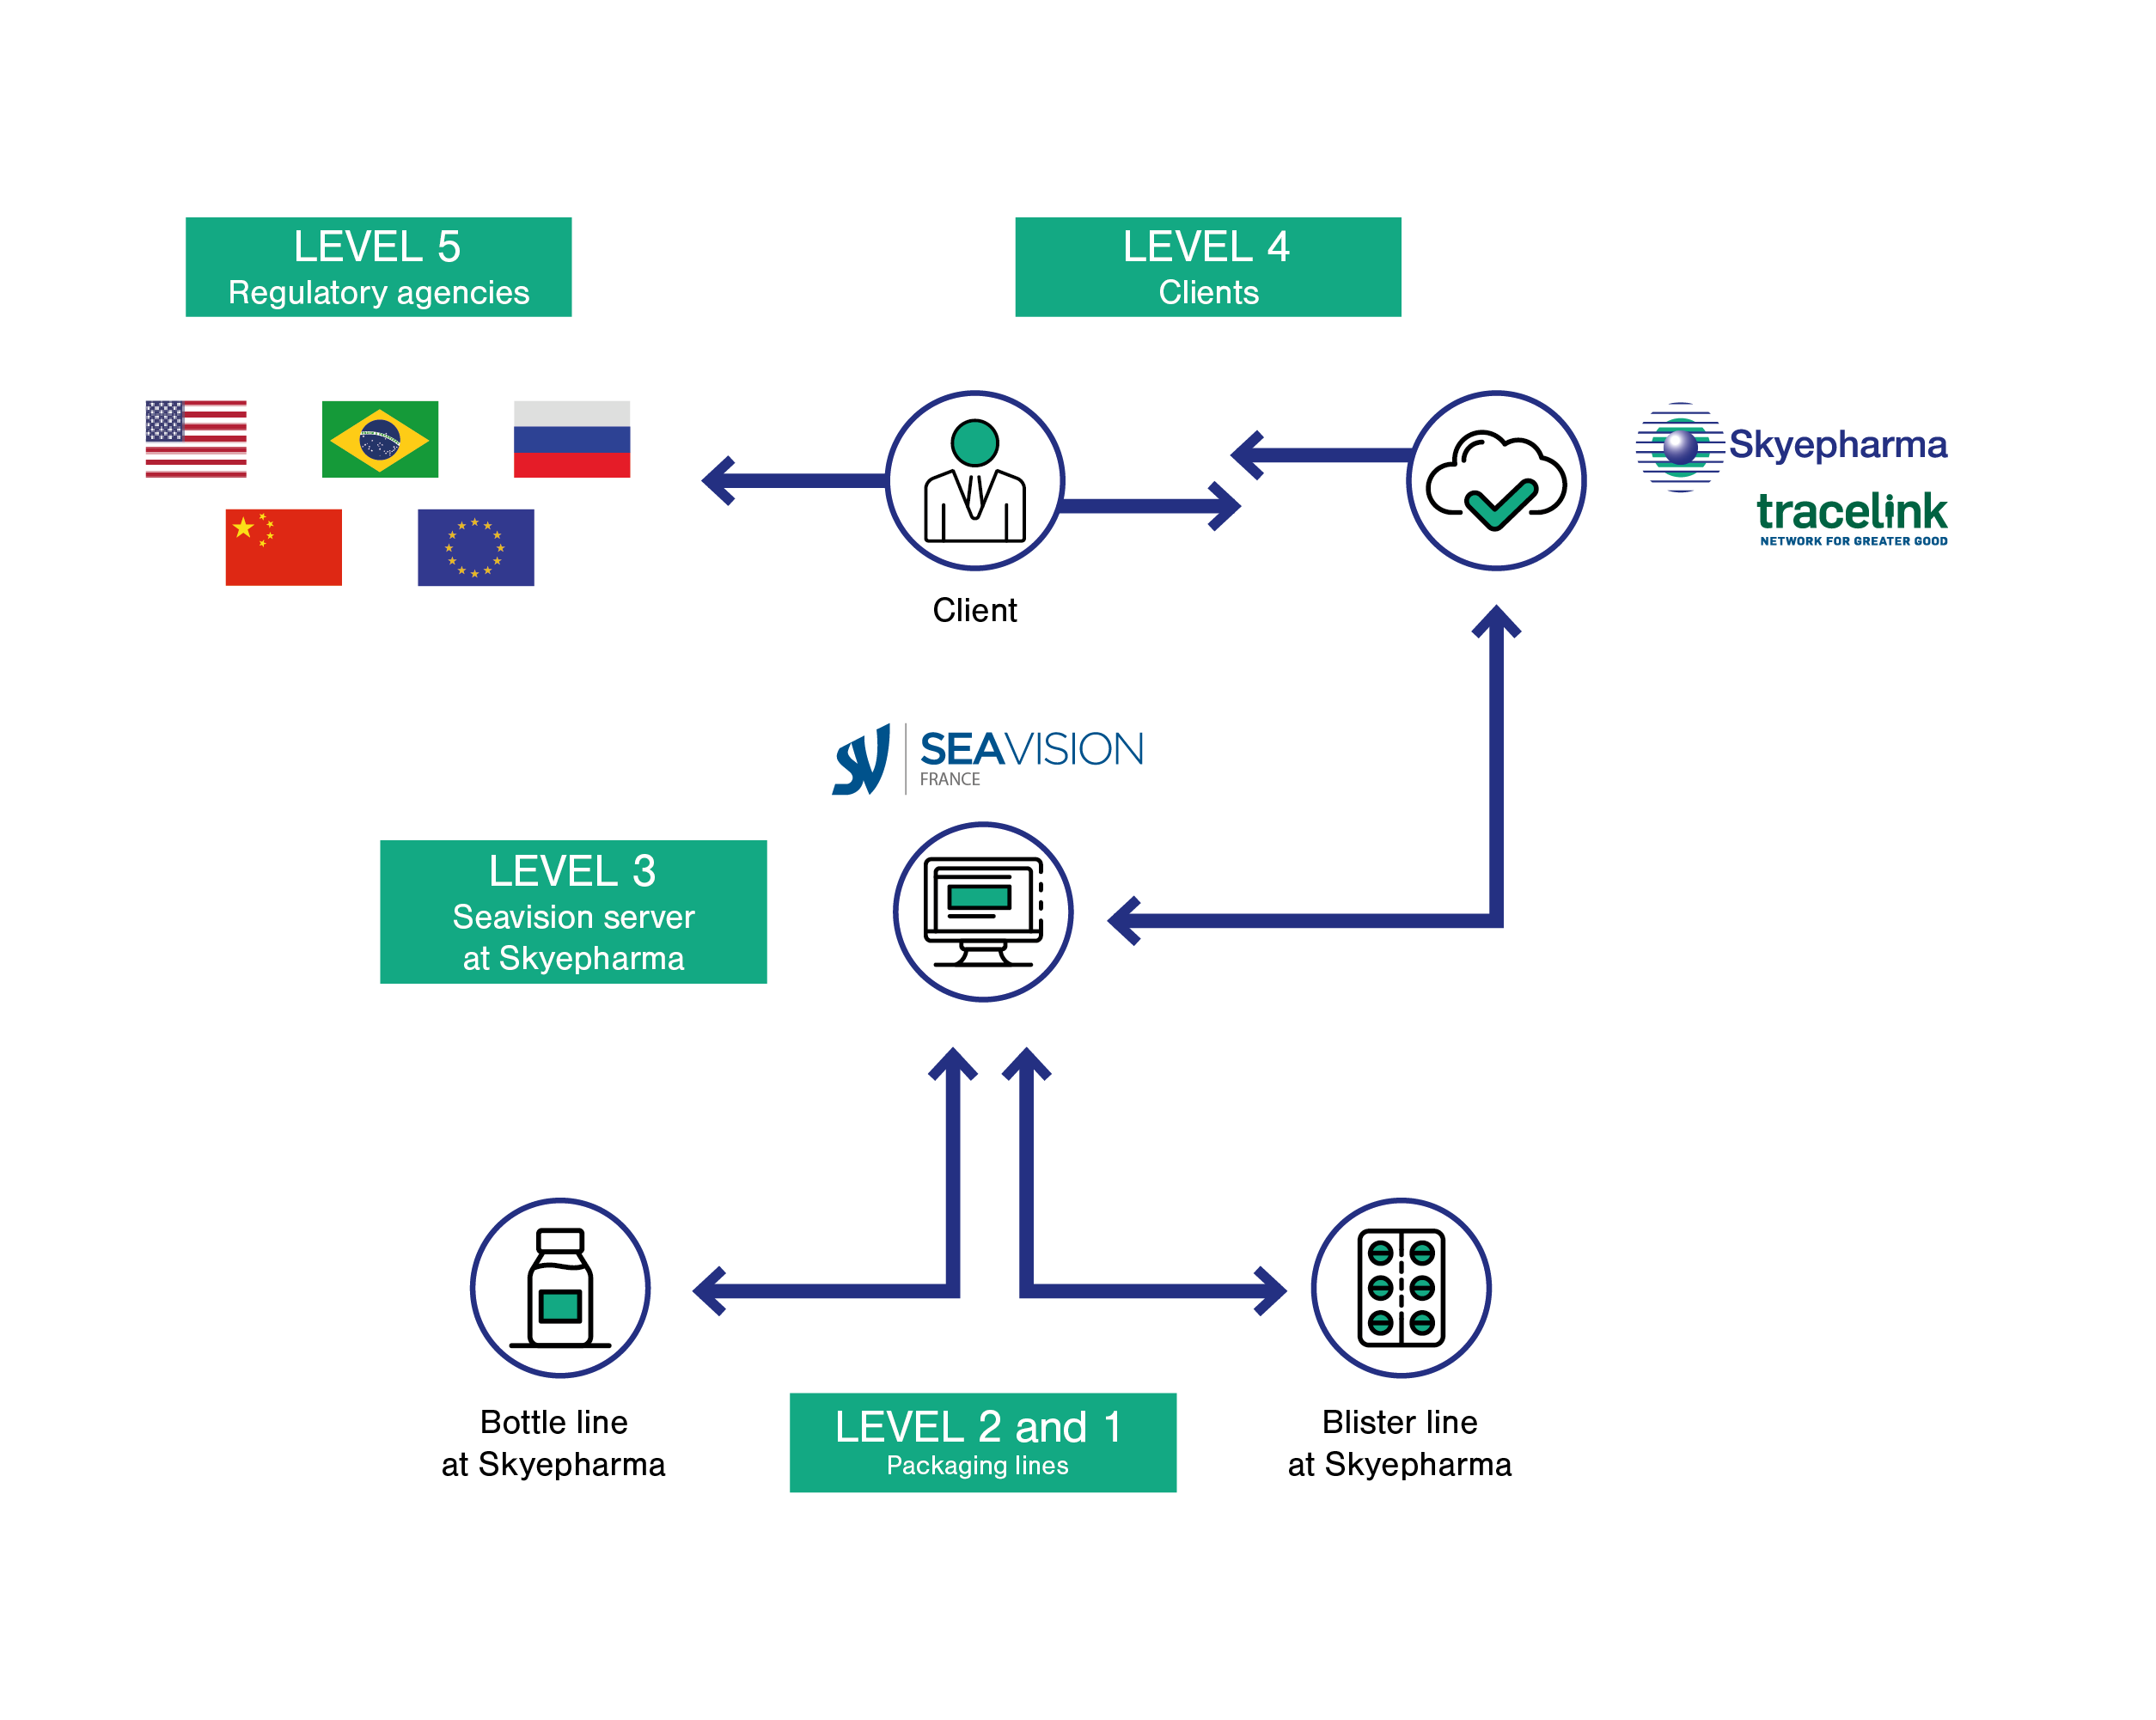 Skyepharma - Serialization management system